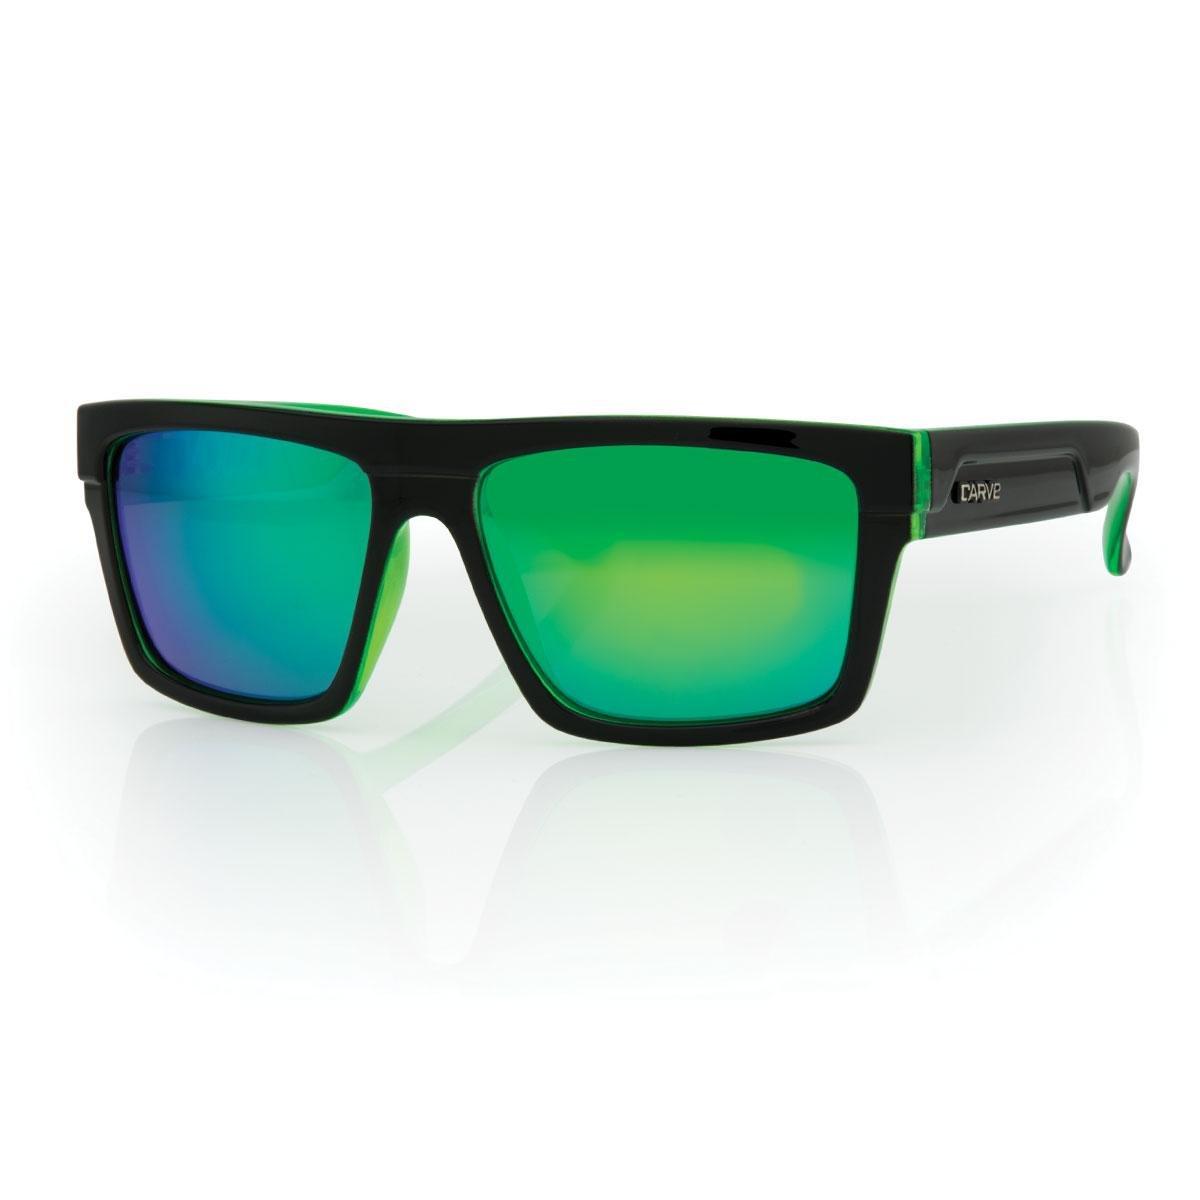 19afaa6c275 Amazon.com  CARVE Volley Sunglasses Black Clear Green Polarized Iridium   Clothing